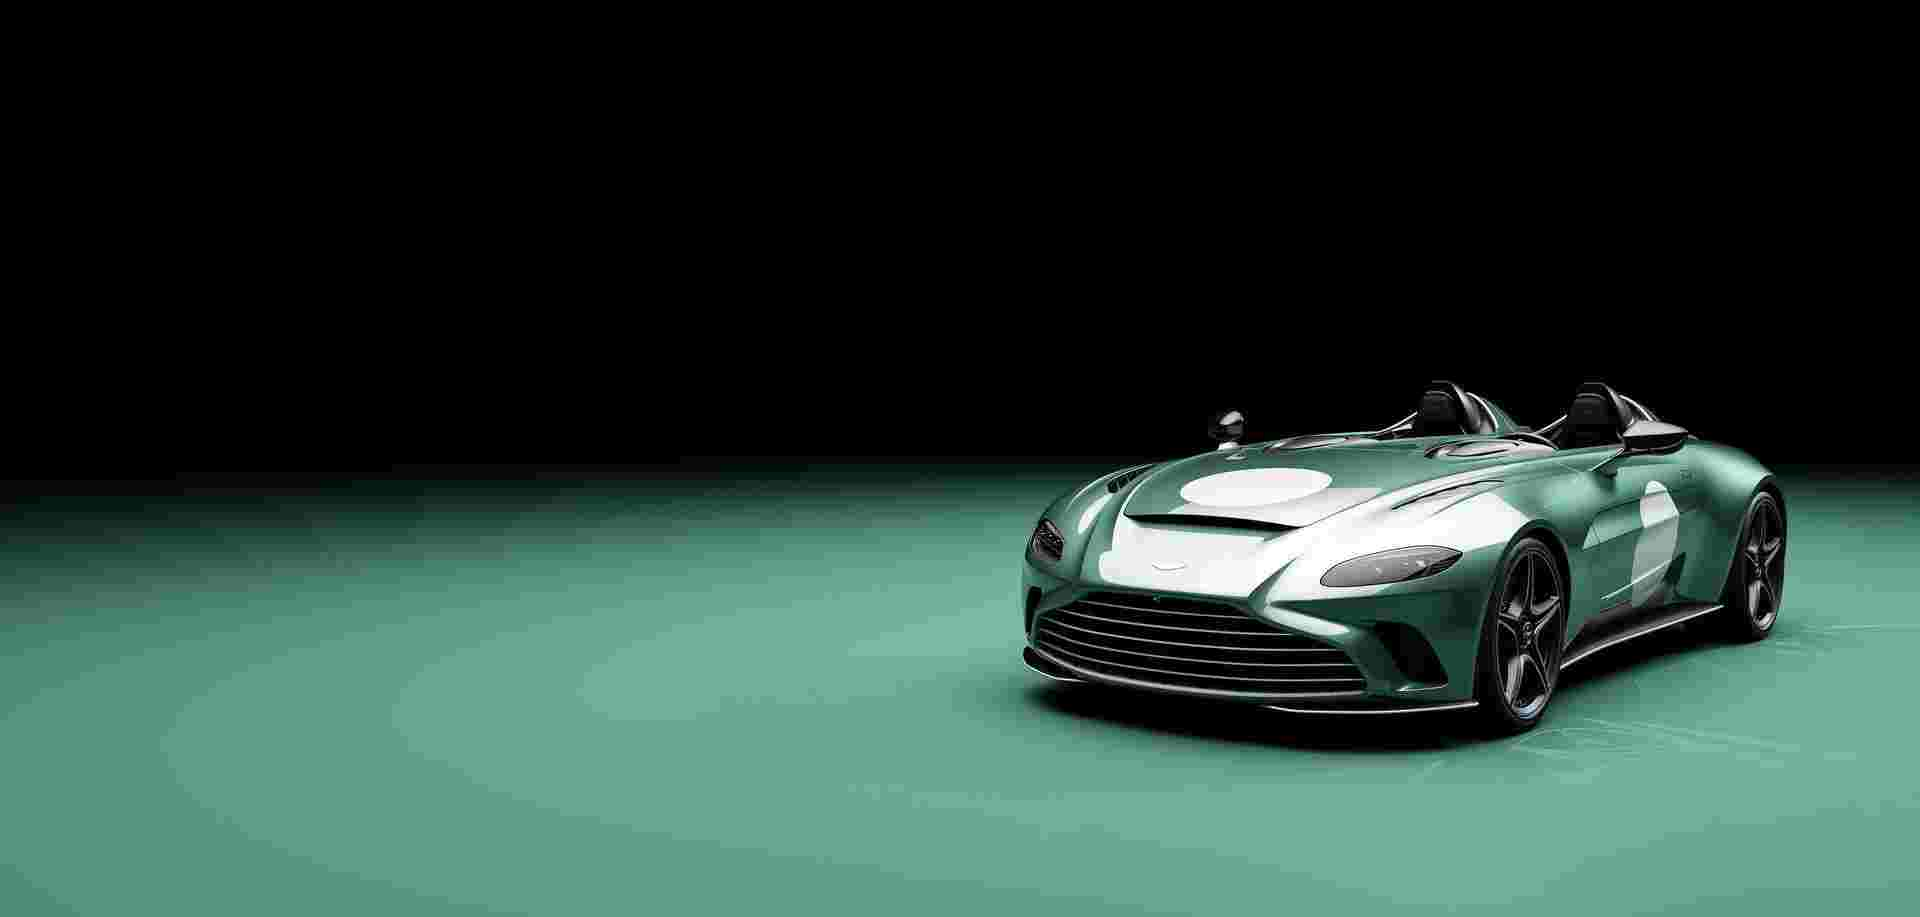 Aston_Martin_V12_Speedster_DBR1_Pack-0002